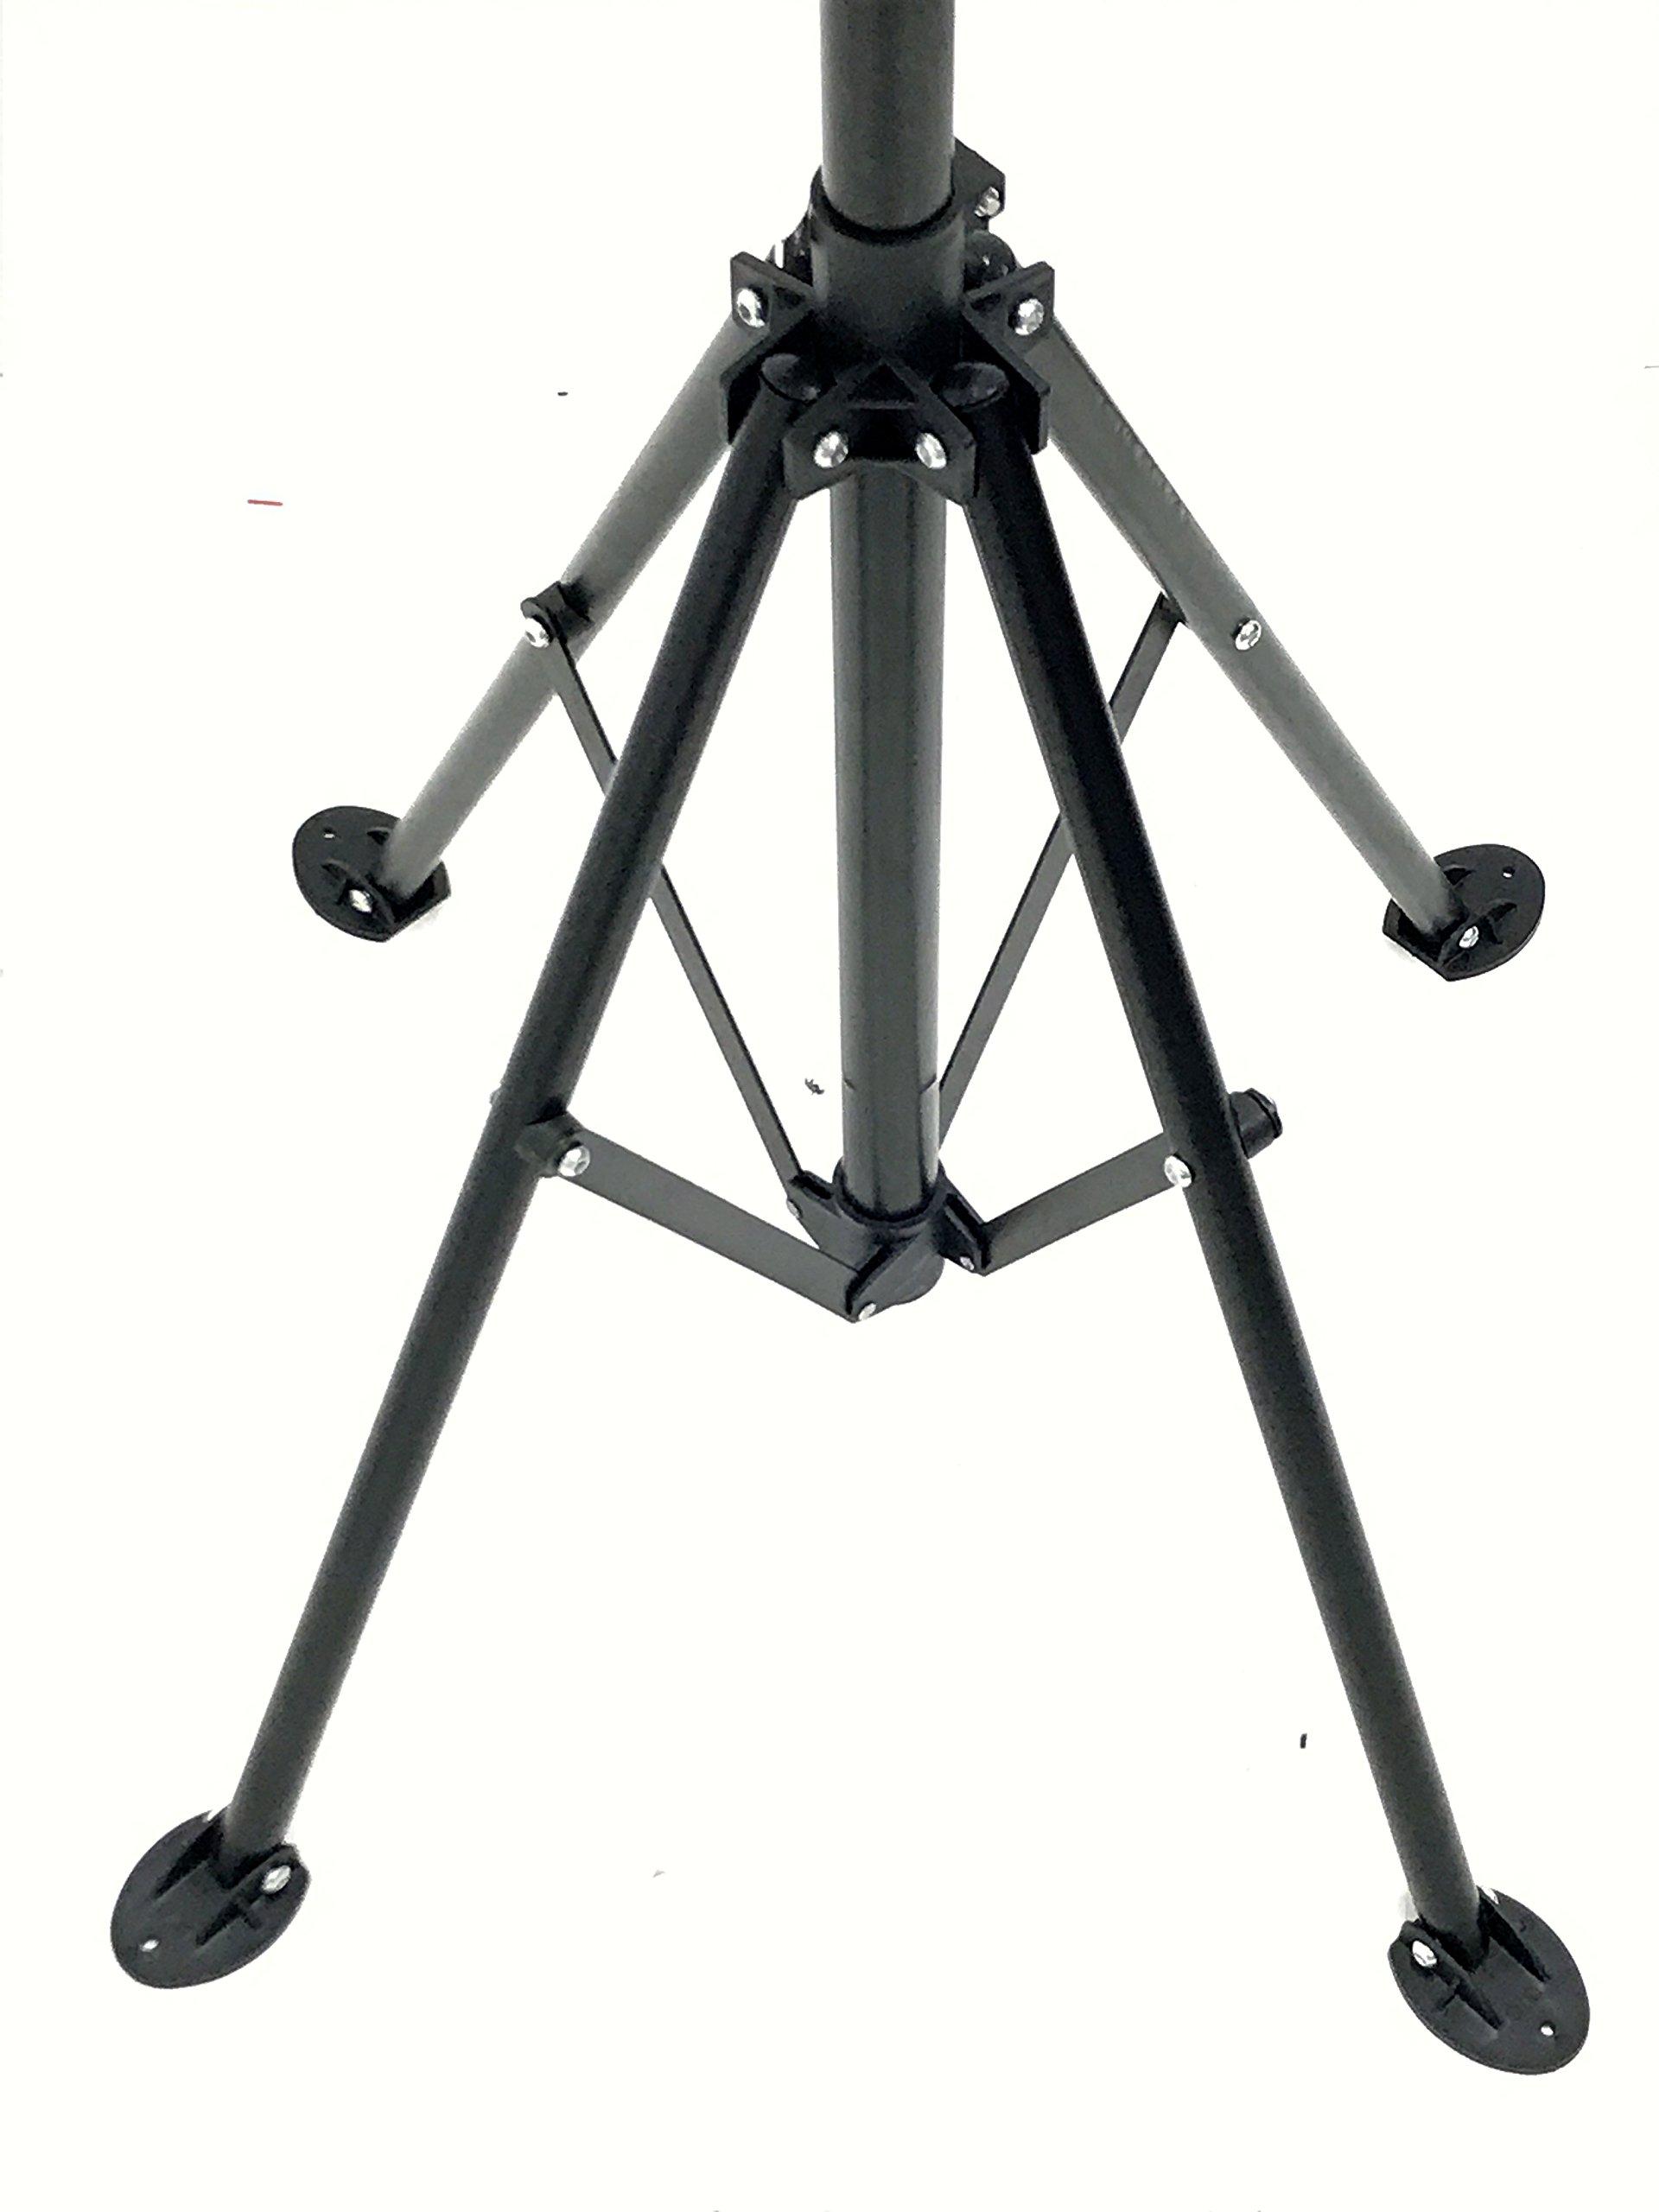 MaxxHaul 80725 Bike Repair Stand/Display with Adjustable Height & 360 Deg. Rotating Head Clamp by MaxxHaul (Image #4)